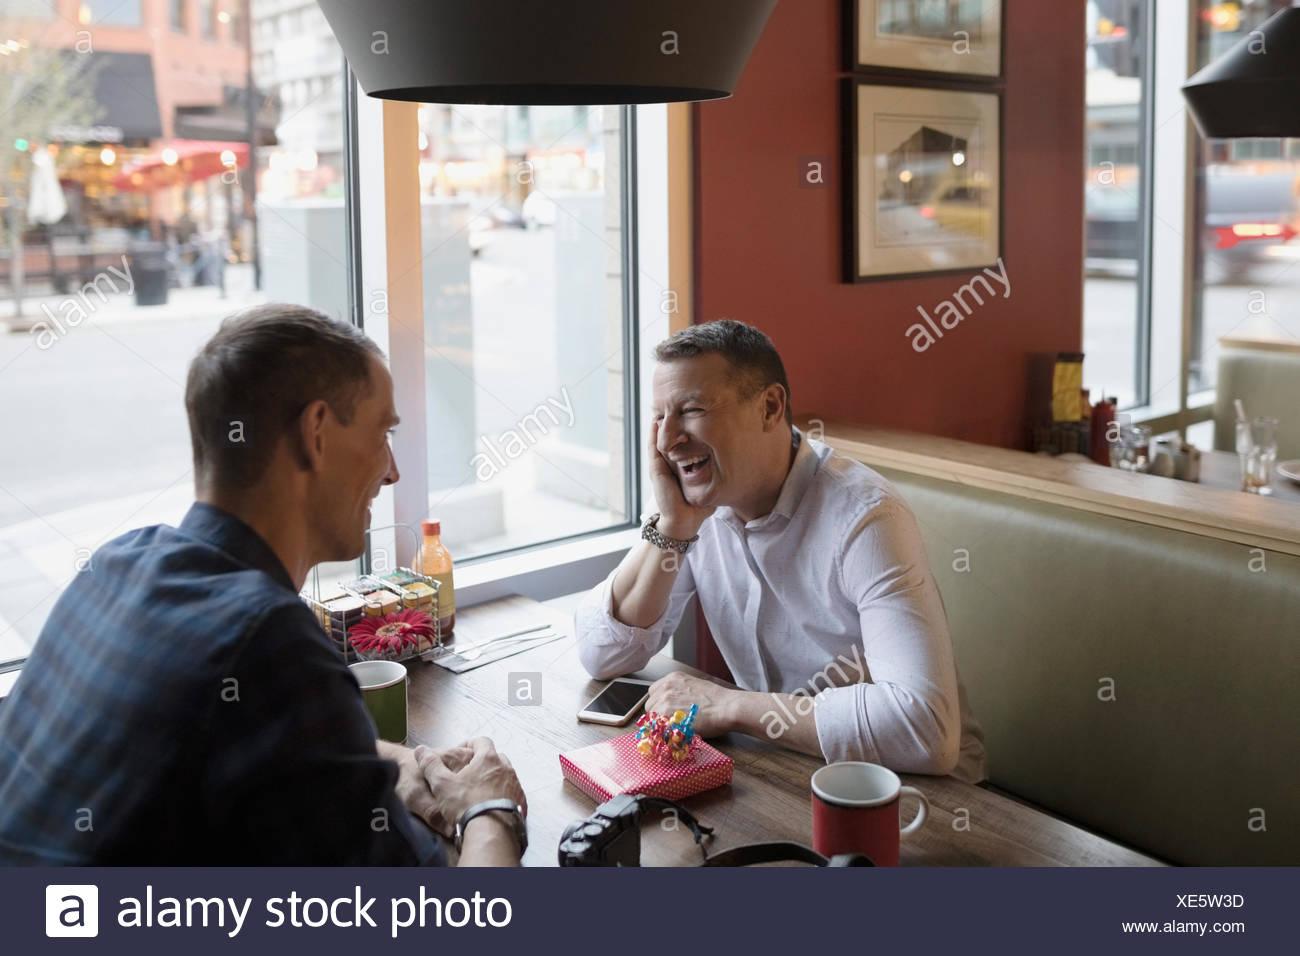 Lächelnd männlichen Homosexuell Paar feiert Geburtstag am Imbiss-Stand Stockbild